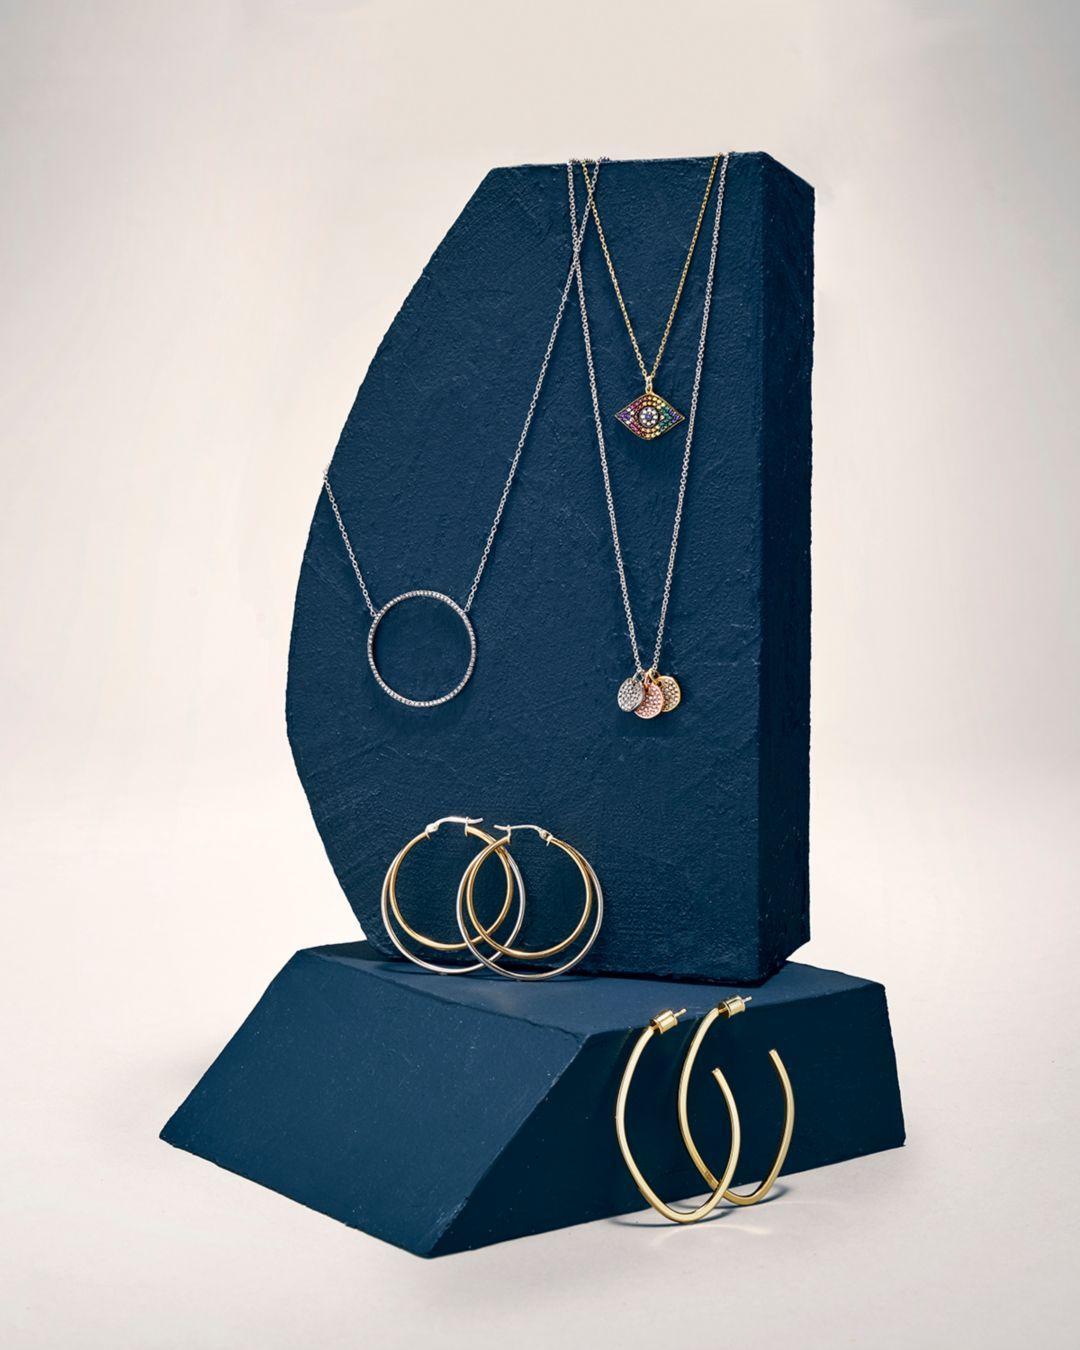 Aqua Pavé Tricolor Disc Pendant Necklace In Platinum - Plated Sterling Silver